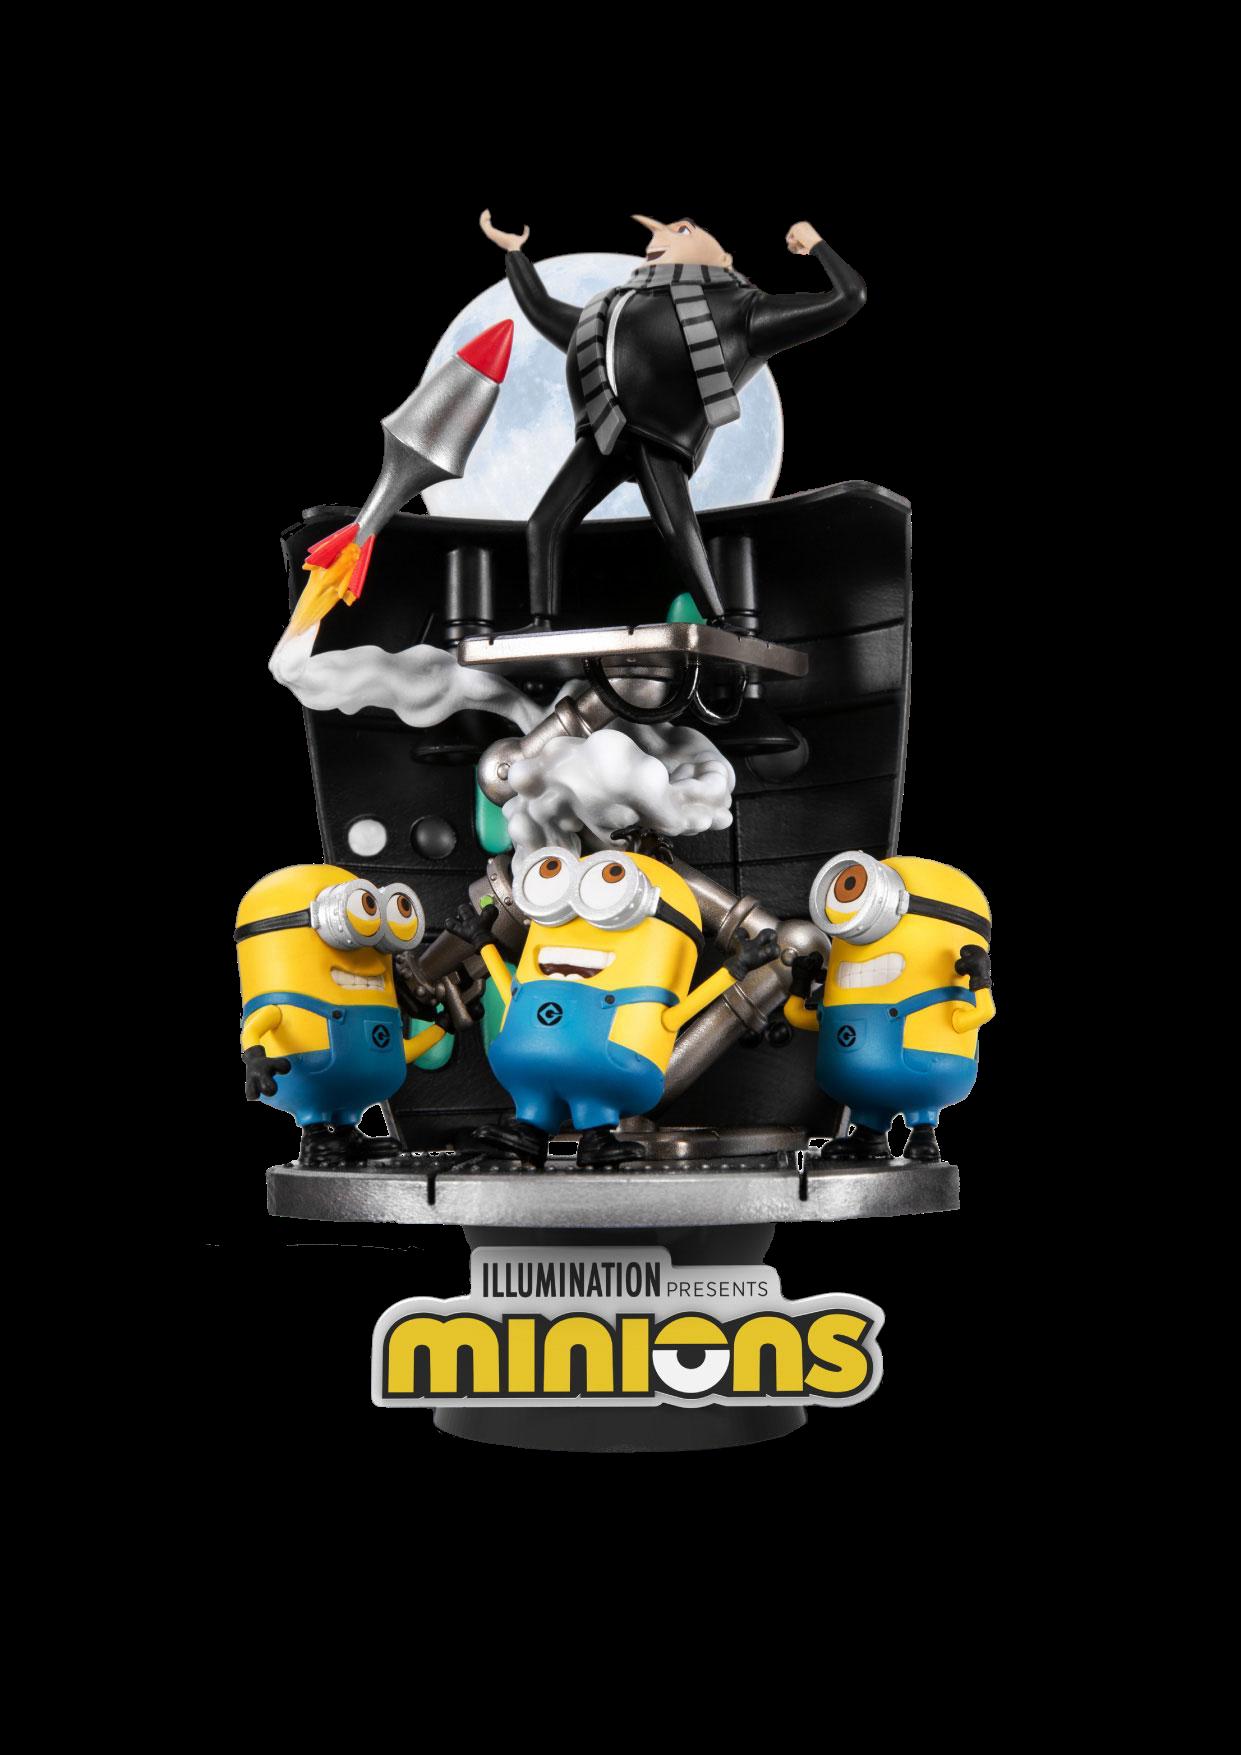 beast-kingdom-toys-minions-stealing-moon-pvc-diorama-toyslife